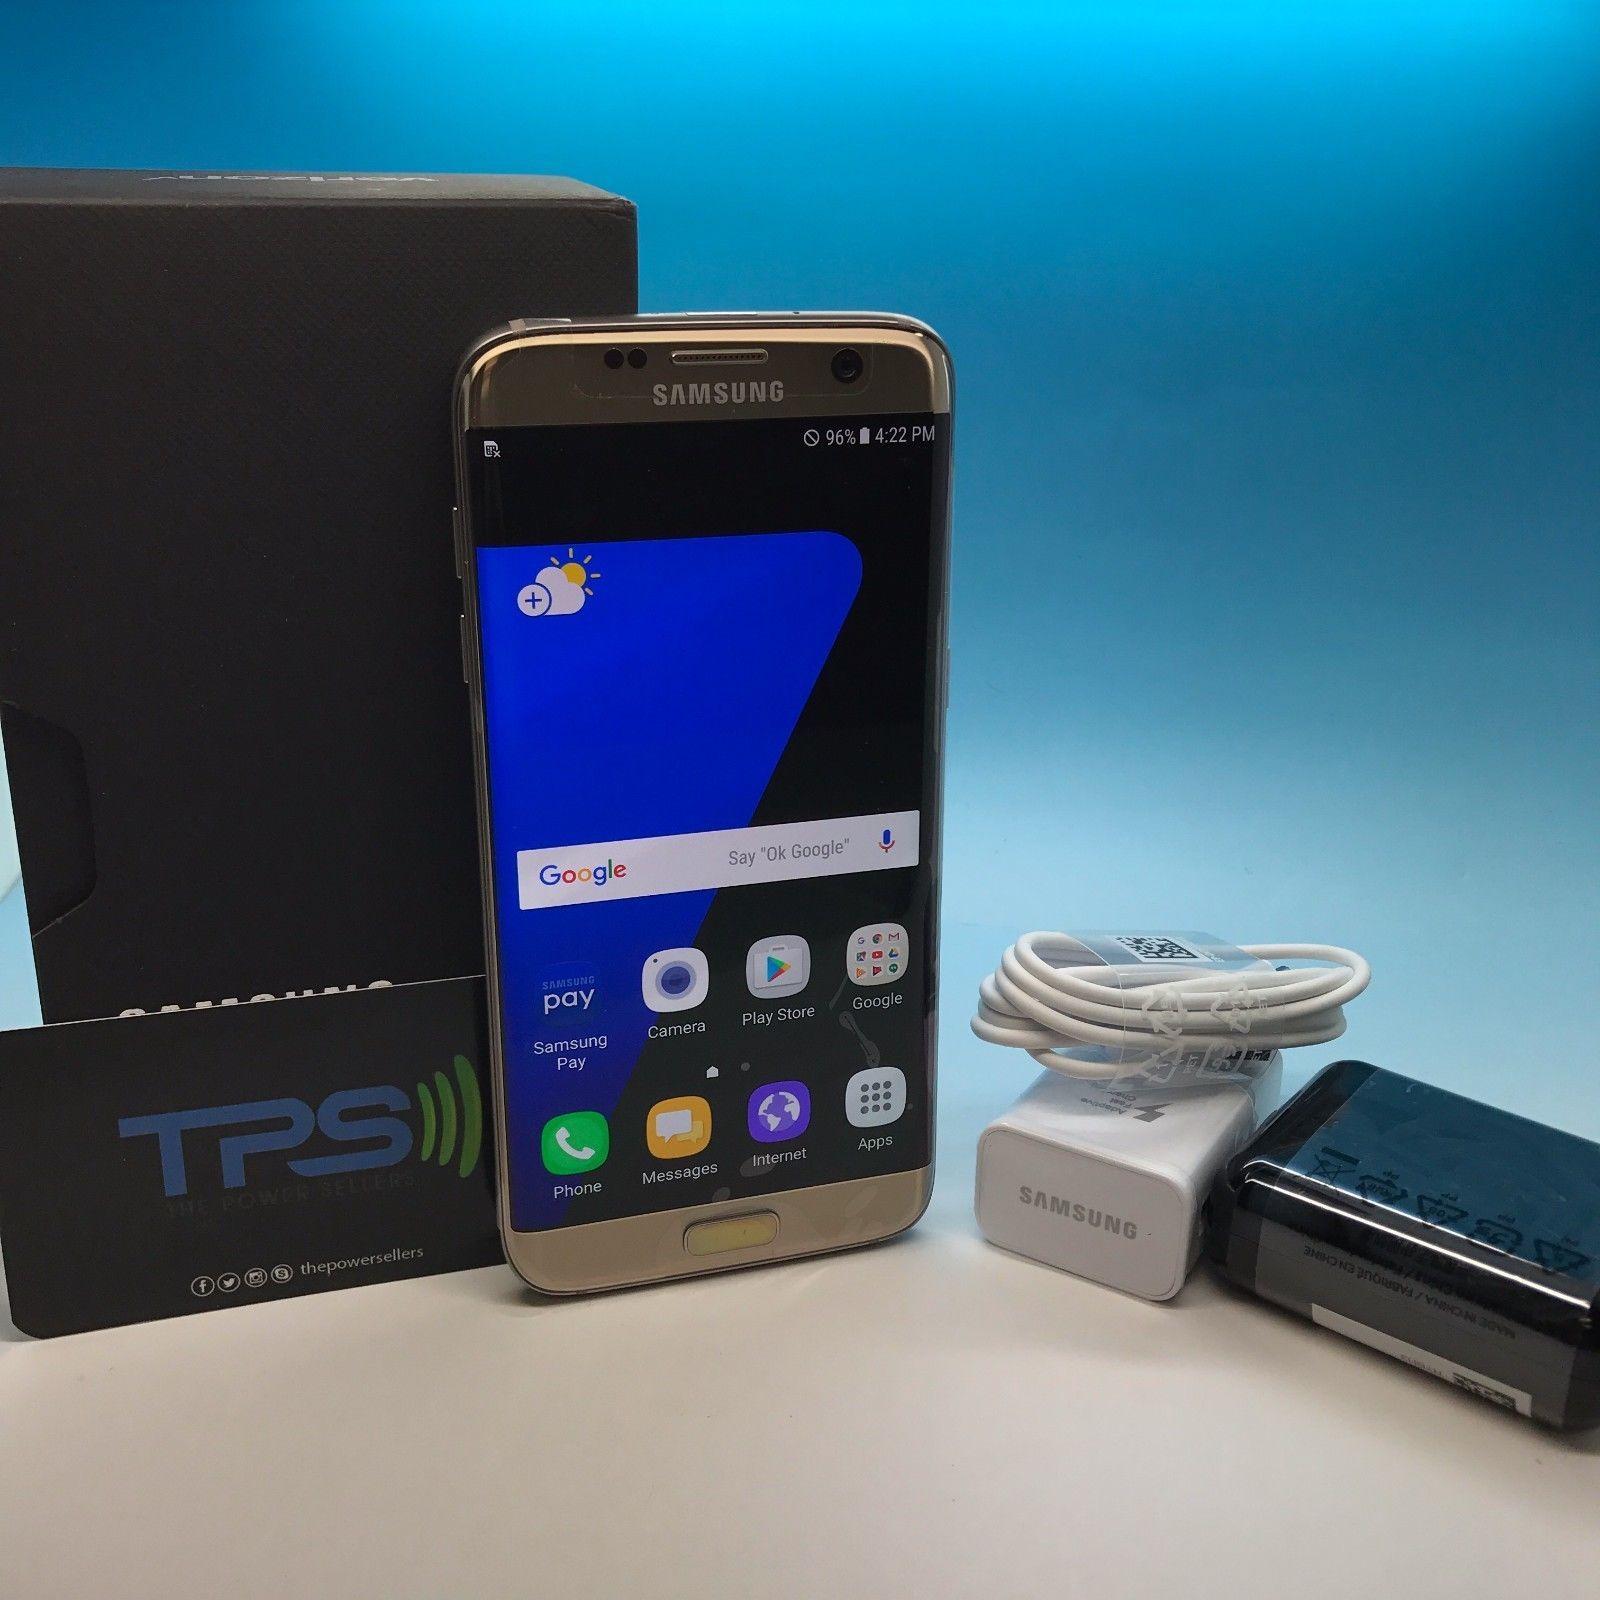 NEW/OPEN BOX UNLOCKED Samsung Galaxy S7 SM-G935V 32GB - Gold GSM Unlocked